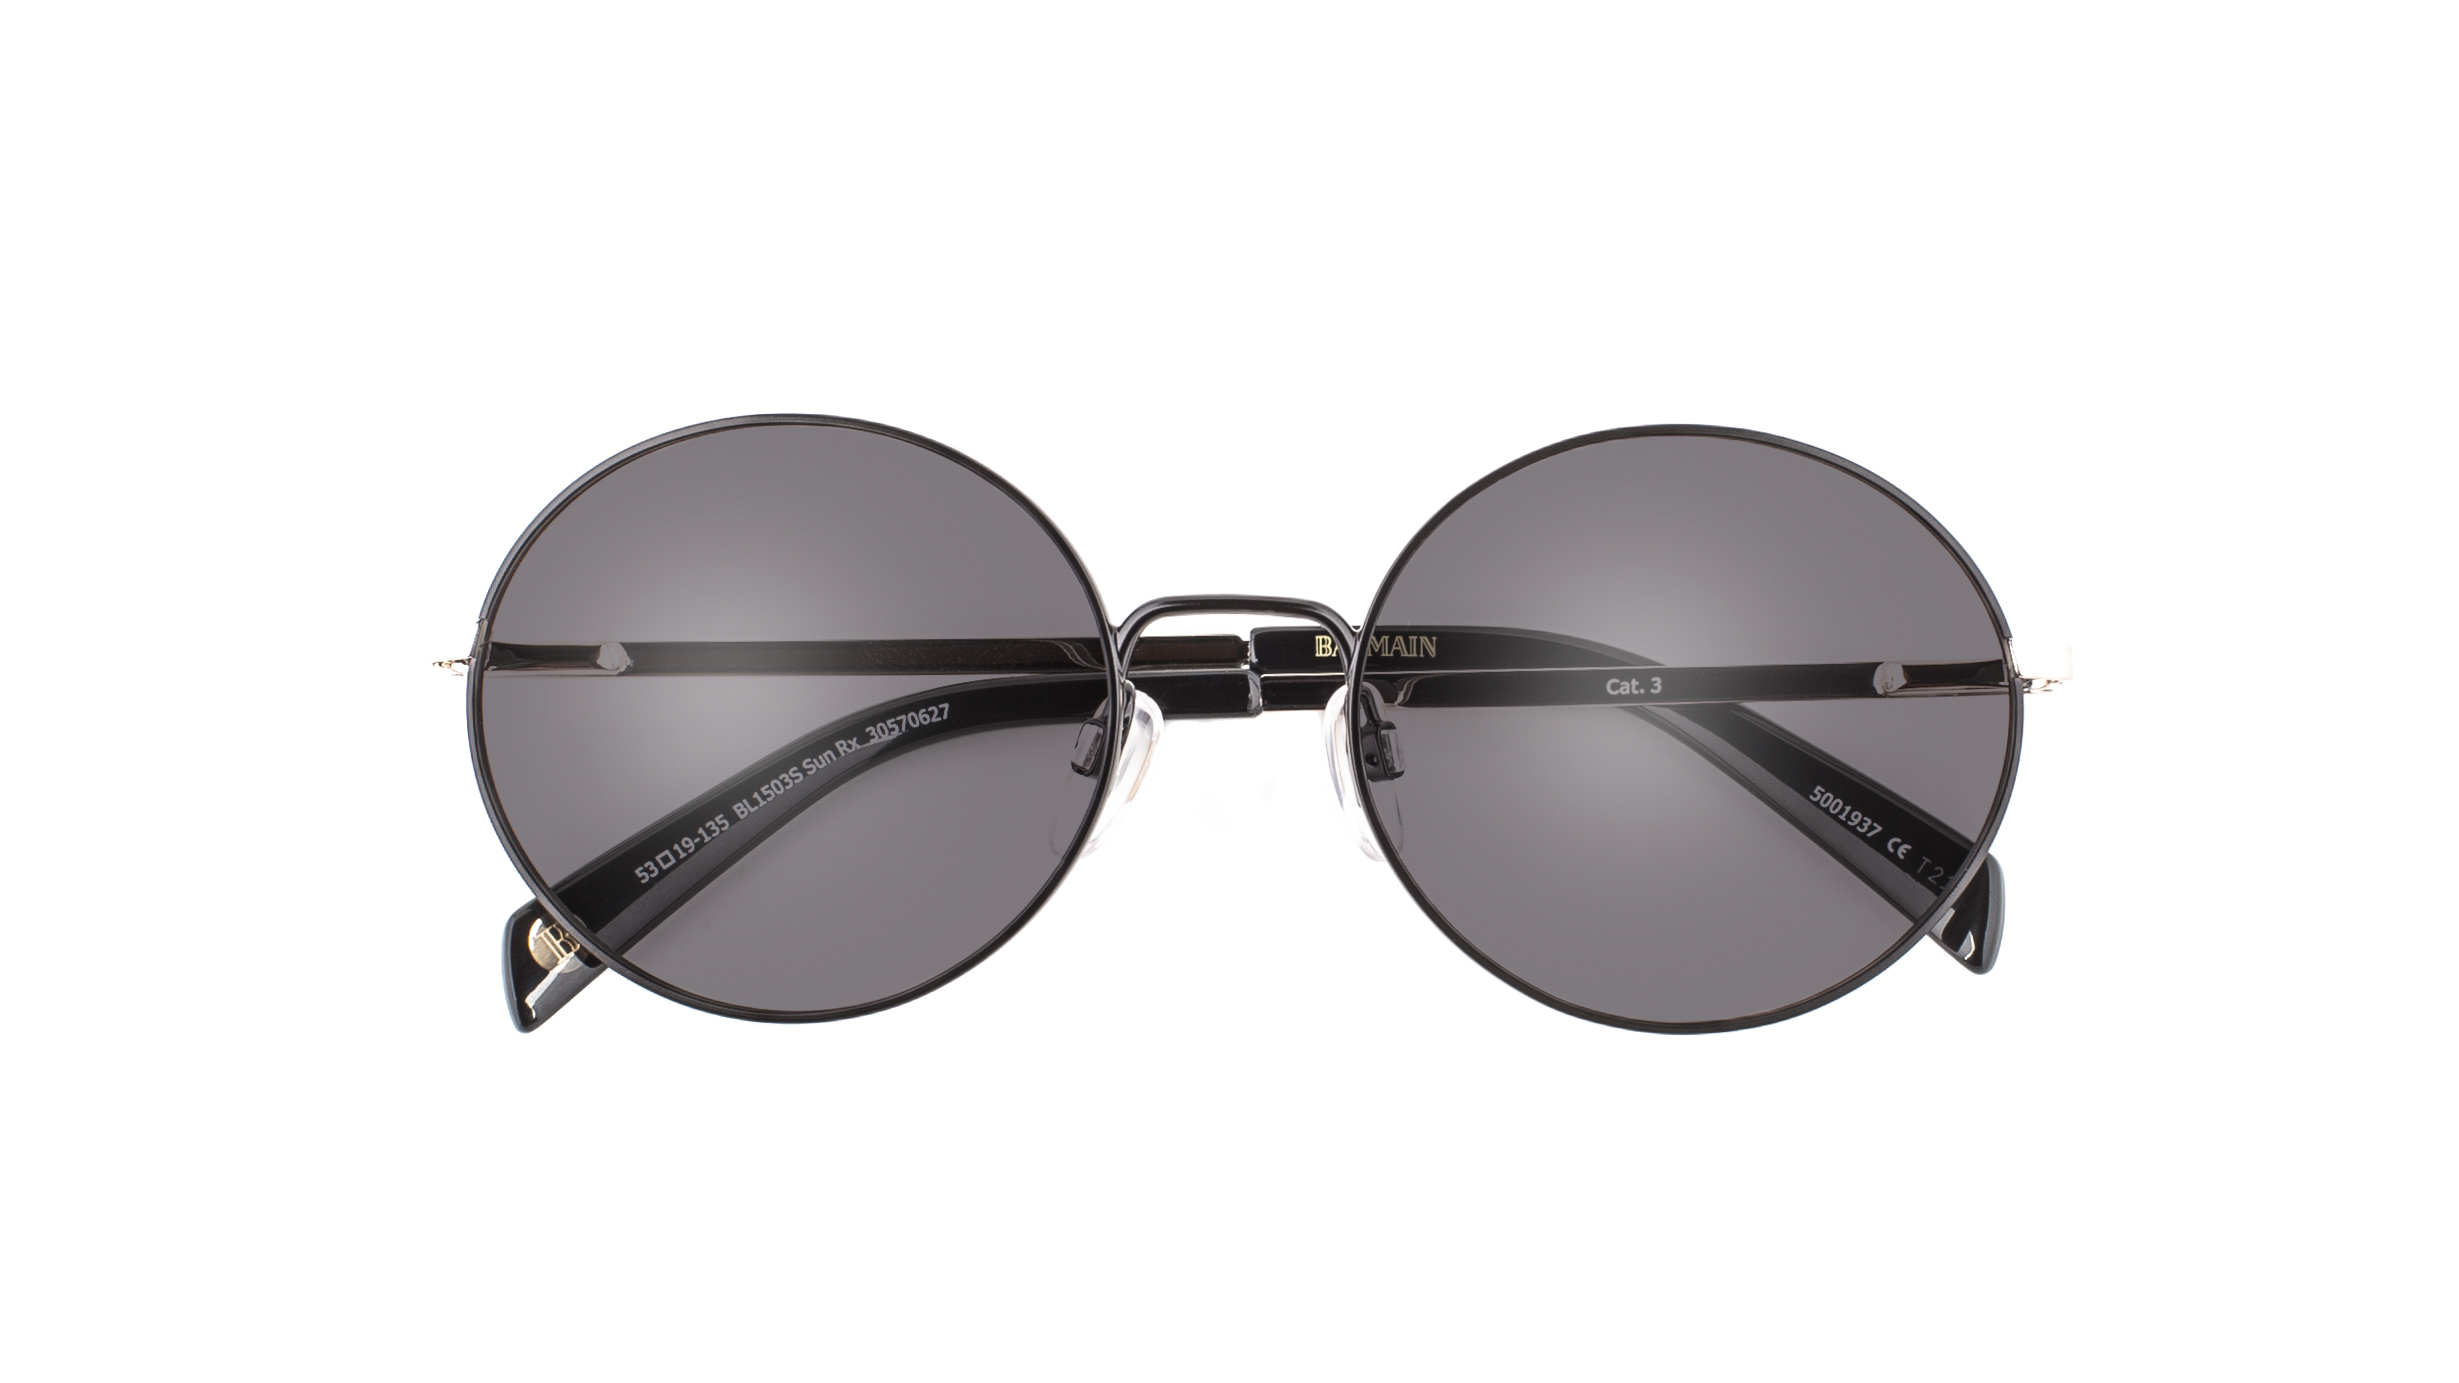 Balmain x Specsavers BL1503 SUN RX 30570627 - RRP 2 pairs single vision $459 (2)